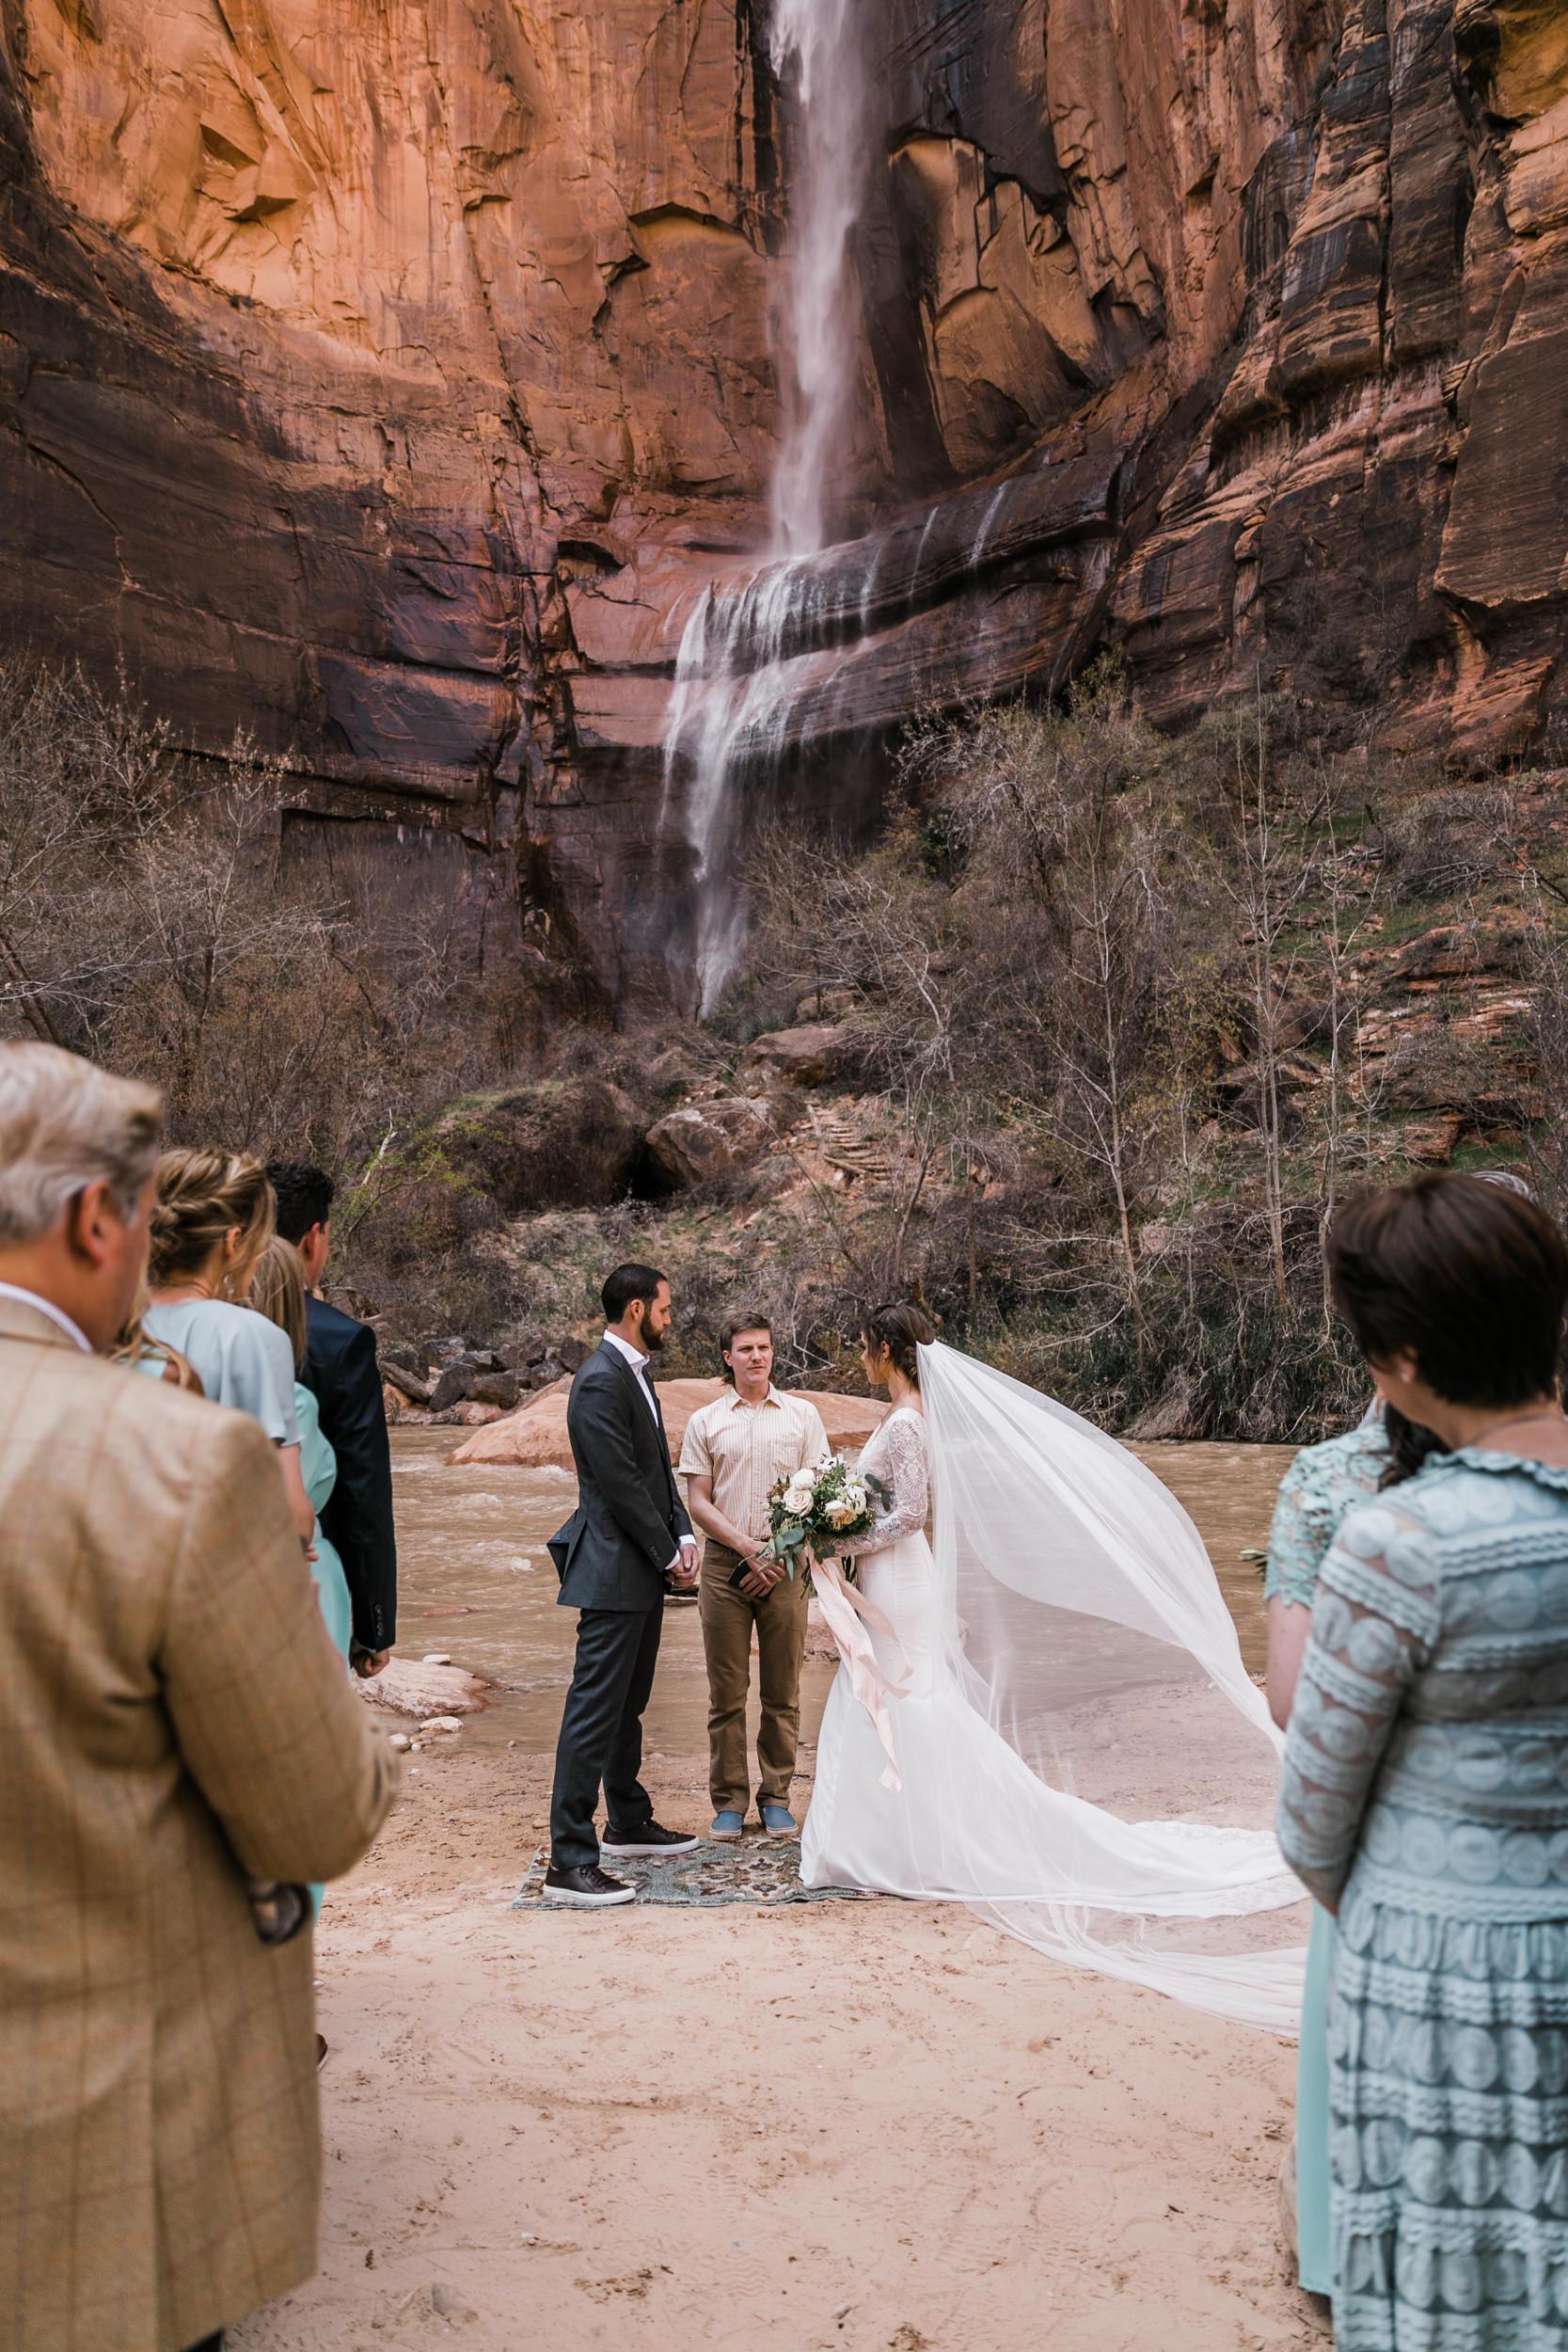 Zion-National-Park-Adventure-Wedding-Hearnes-Elopement-Photography-5.jpg